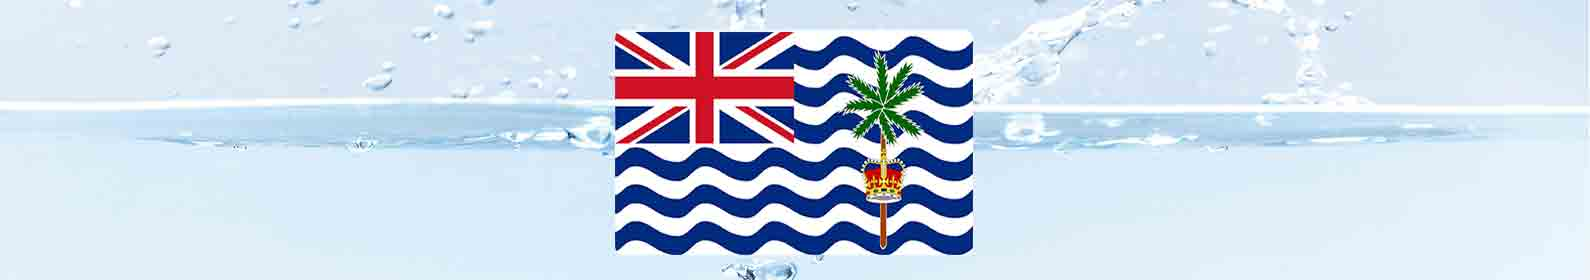 tratamento-de-agua-territorio-britanico-do-oceano-indico.jpg